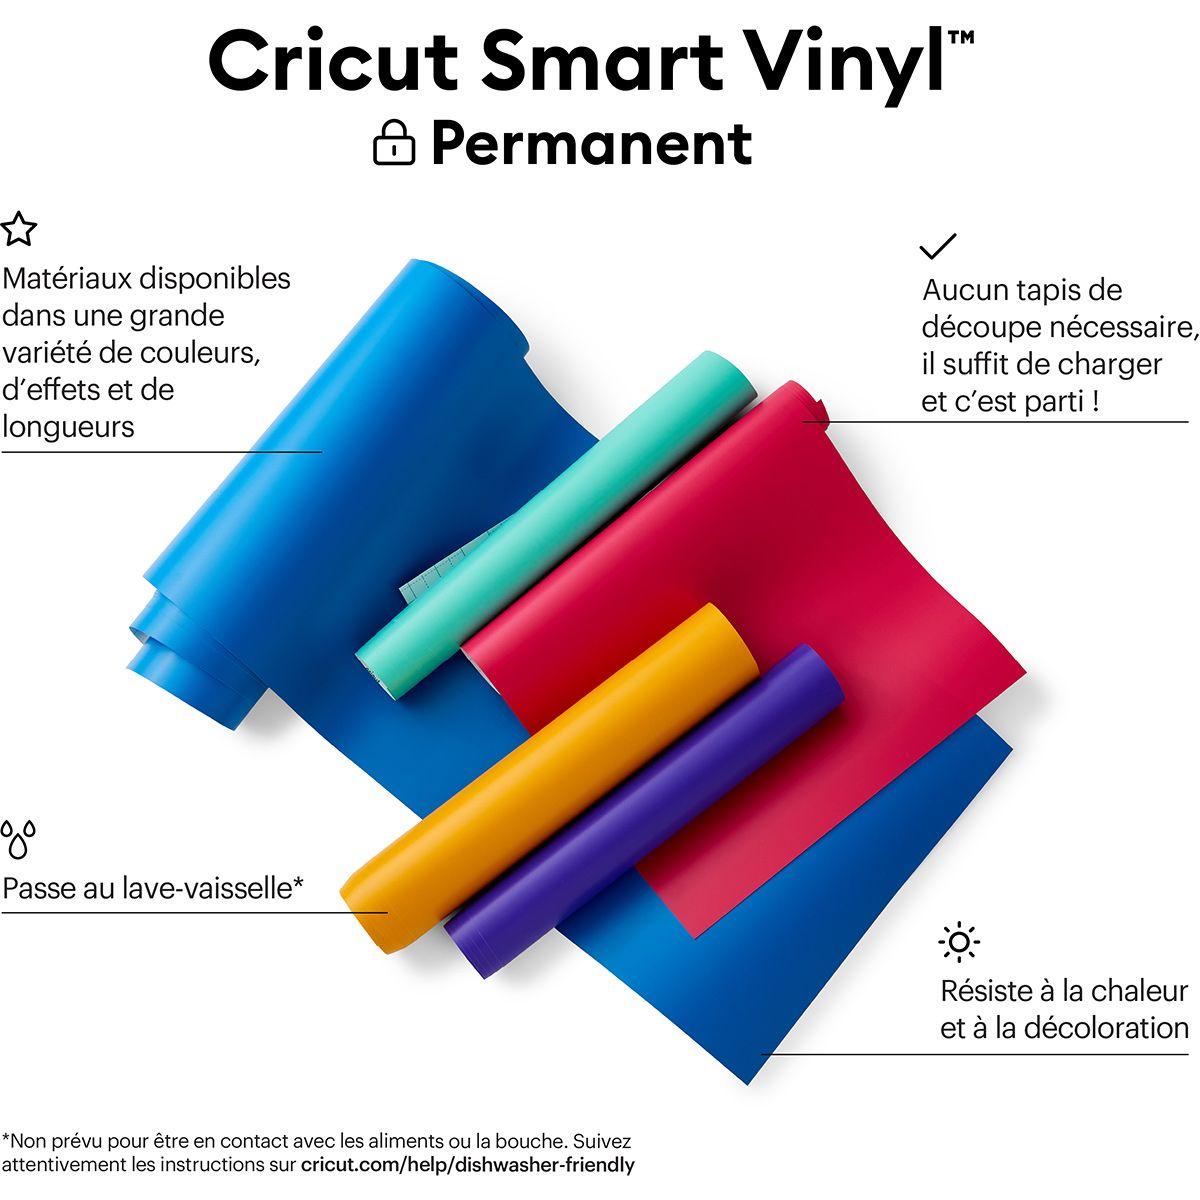 Film vinyle permanent 33 cm x 91 cm Cricut